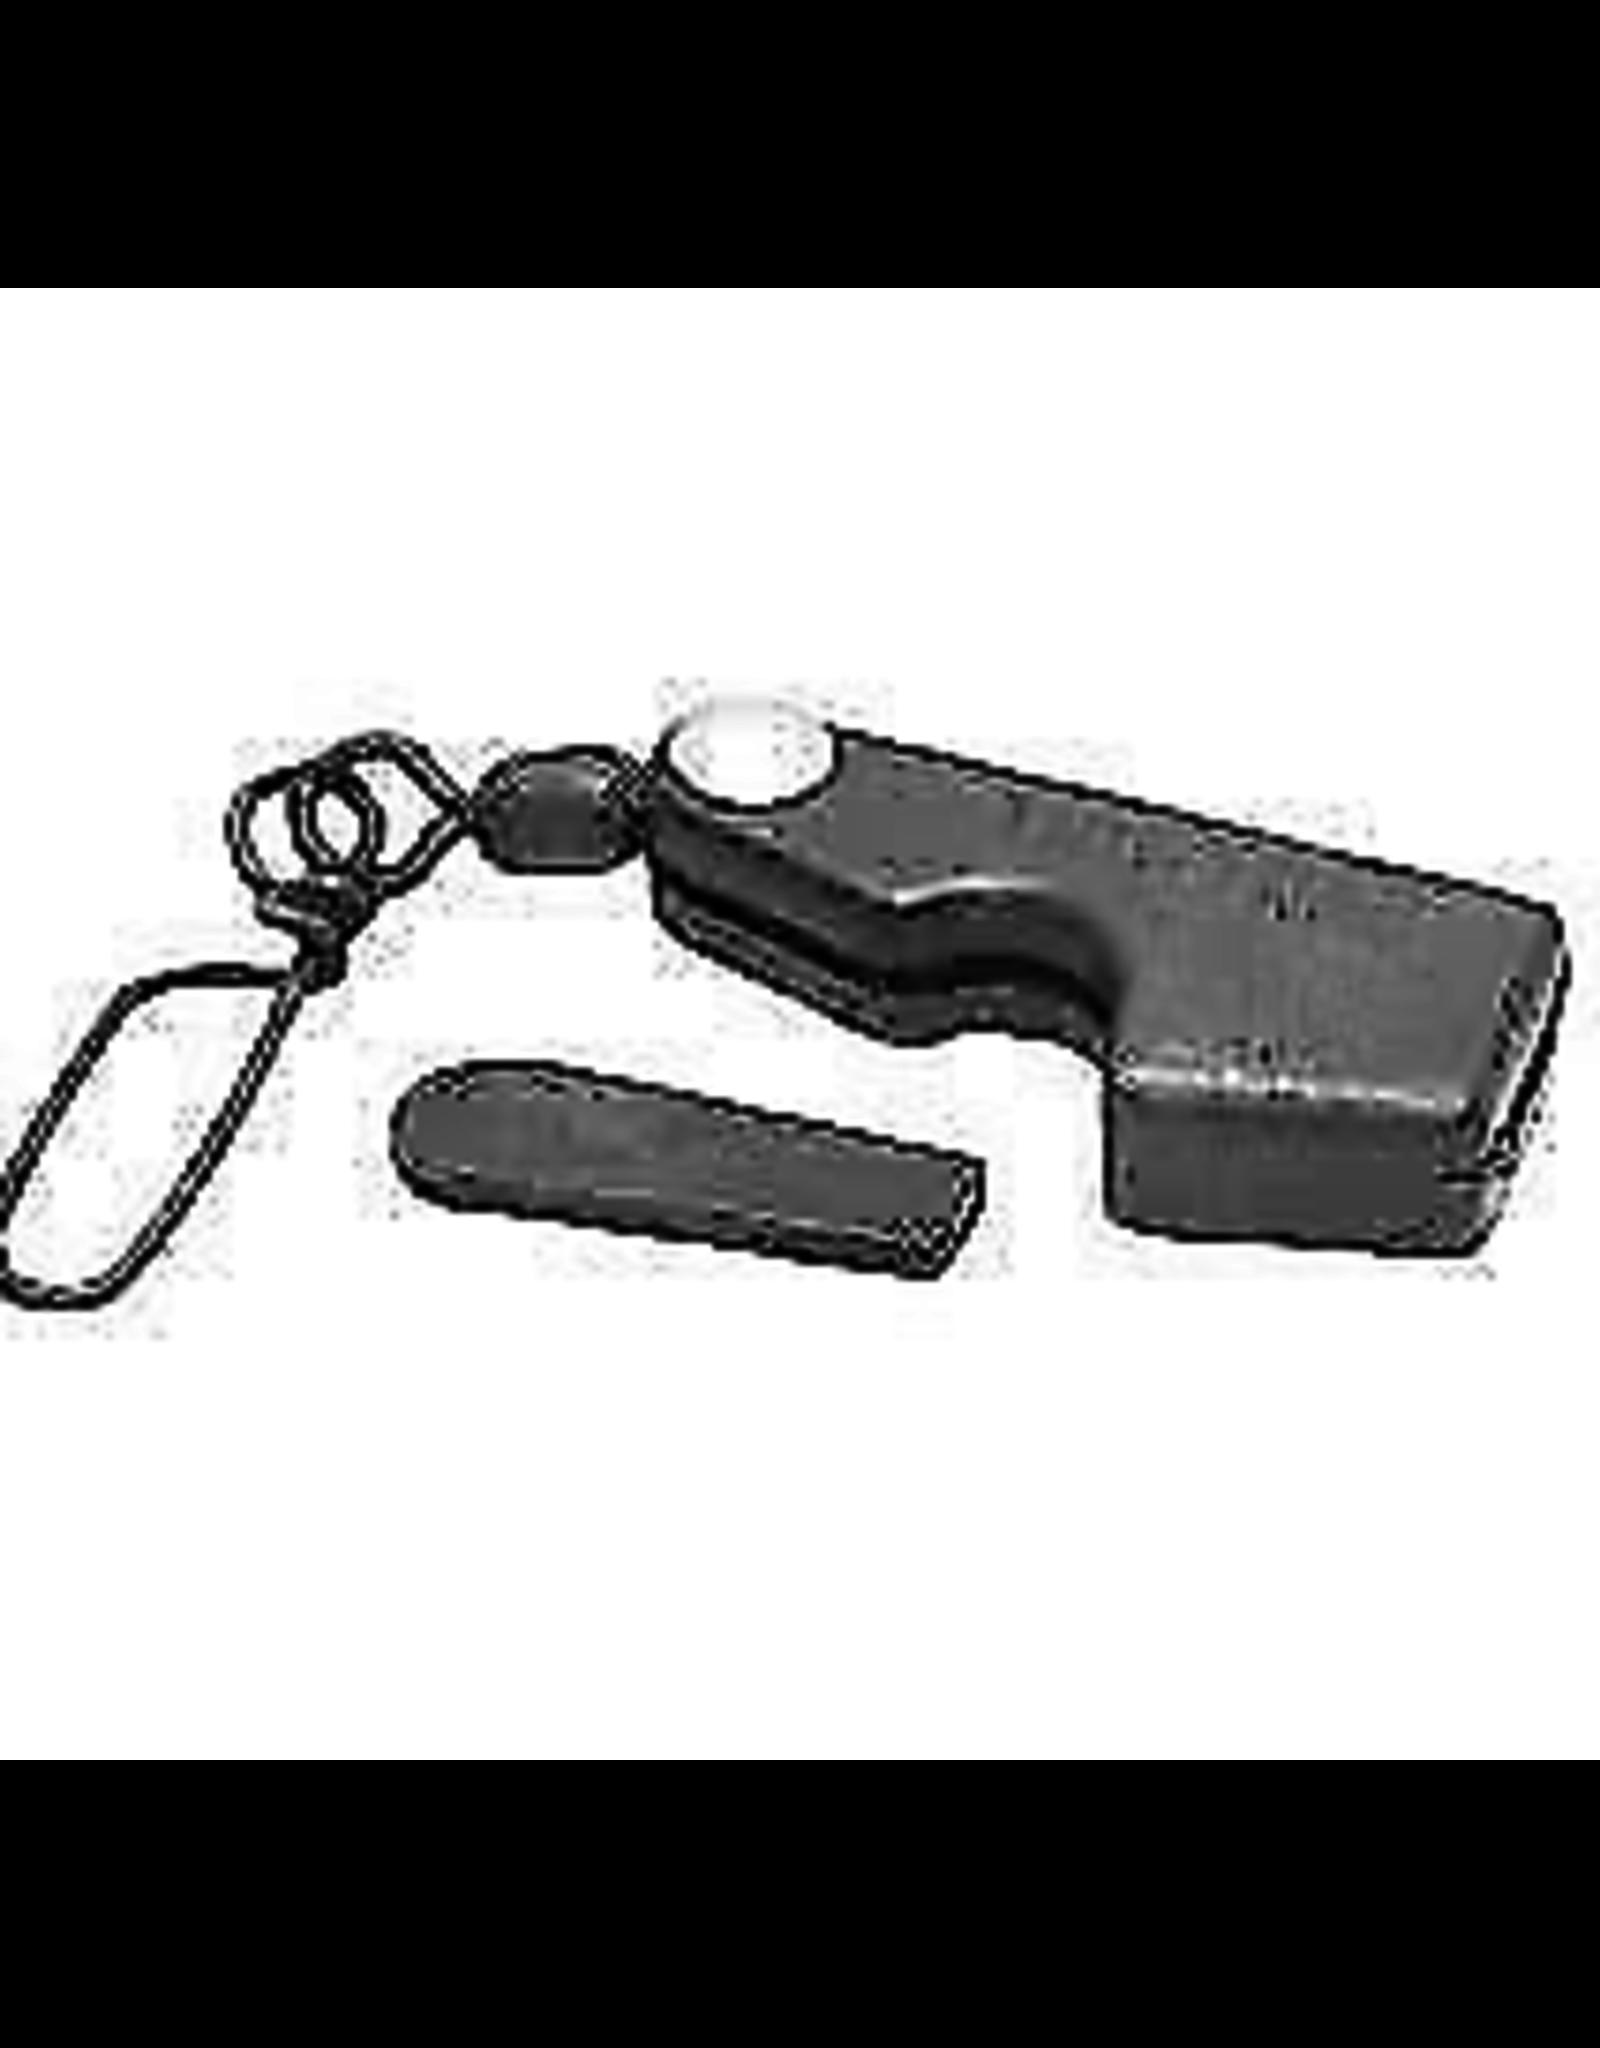 Klincher Down Rigger Cable Terminator